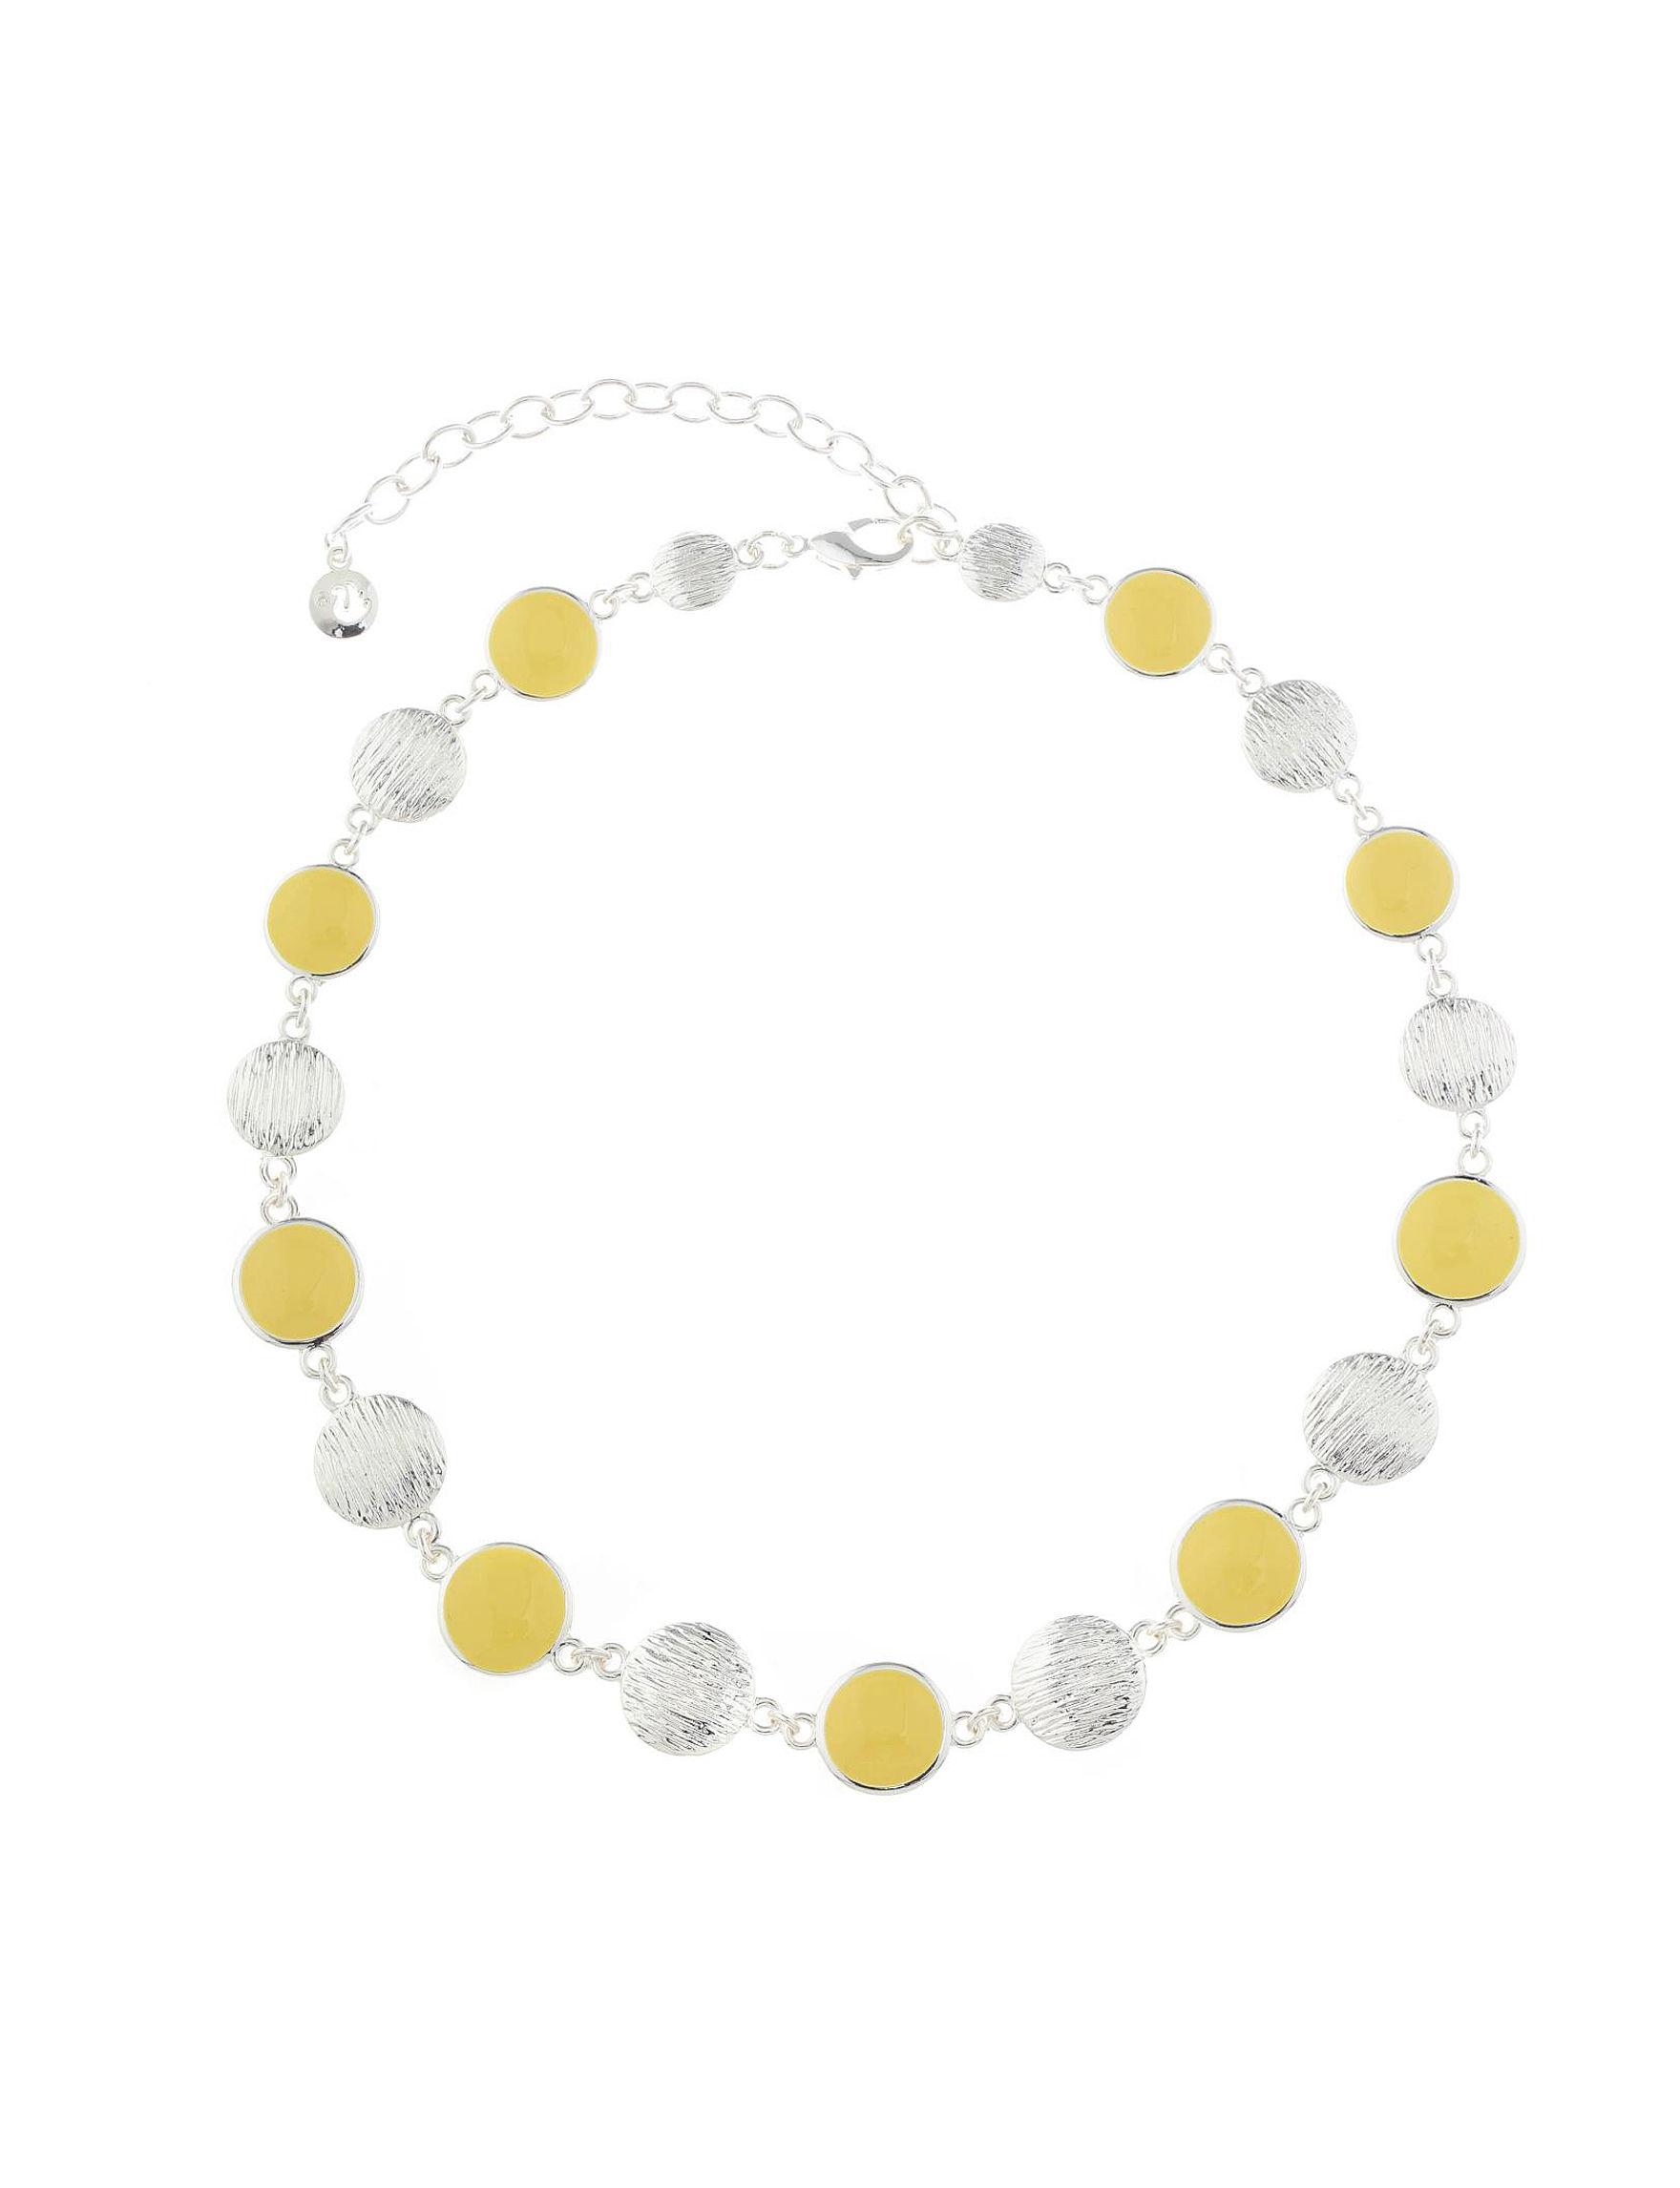 Gloria Vanderbilt Yellow / Silver Necklaces & Pendants Fashion Jewelry